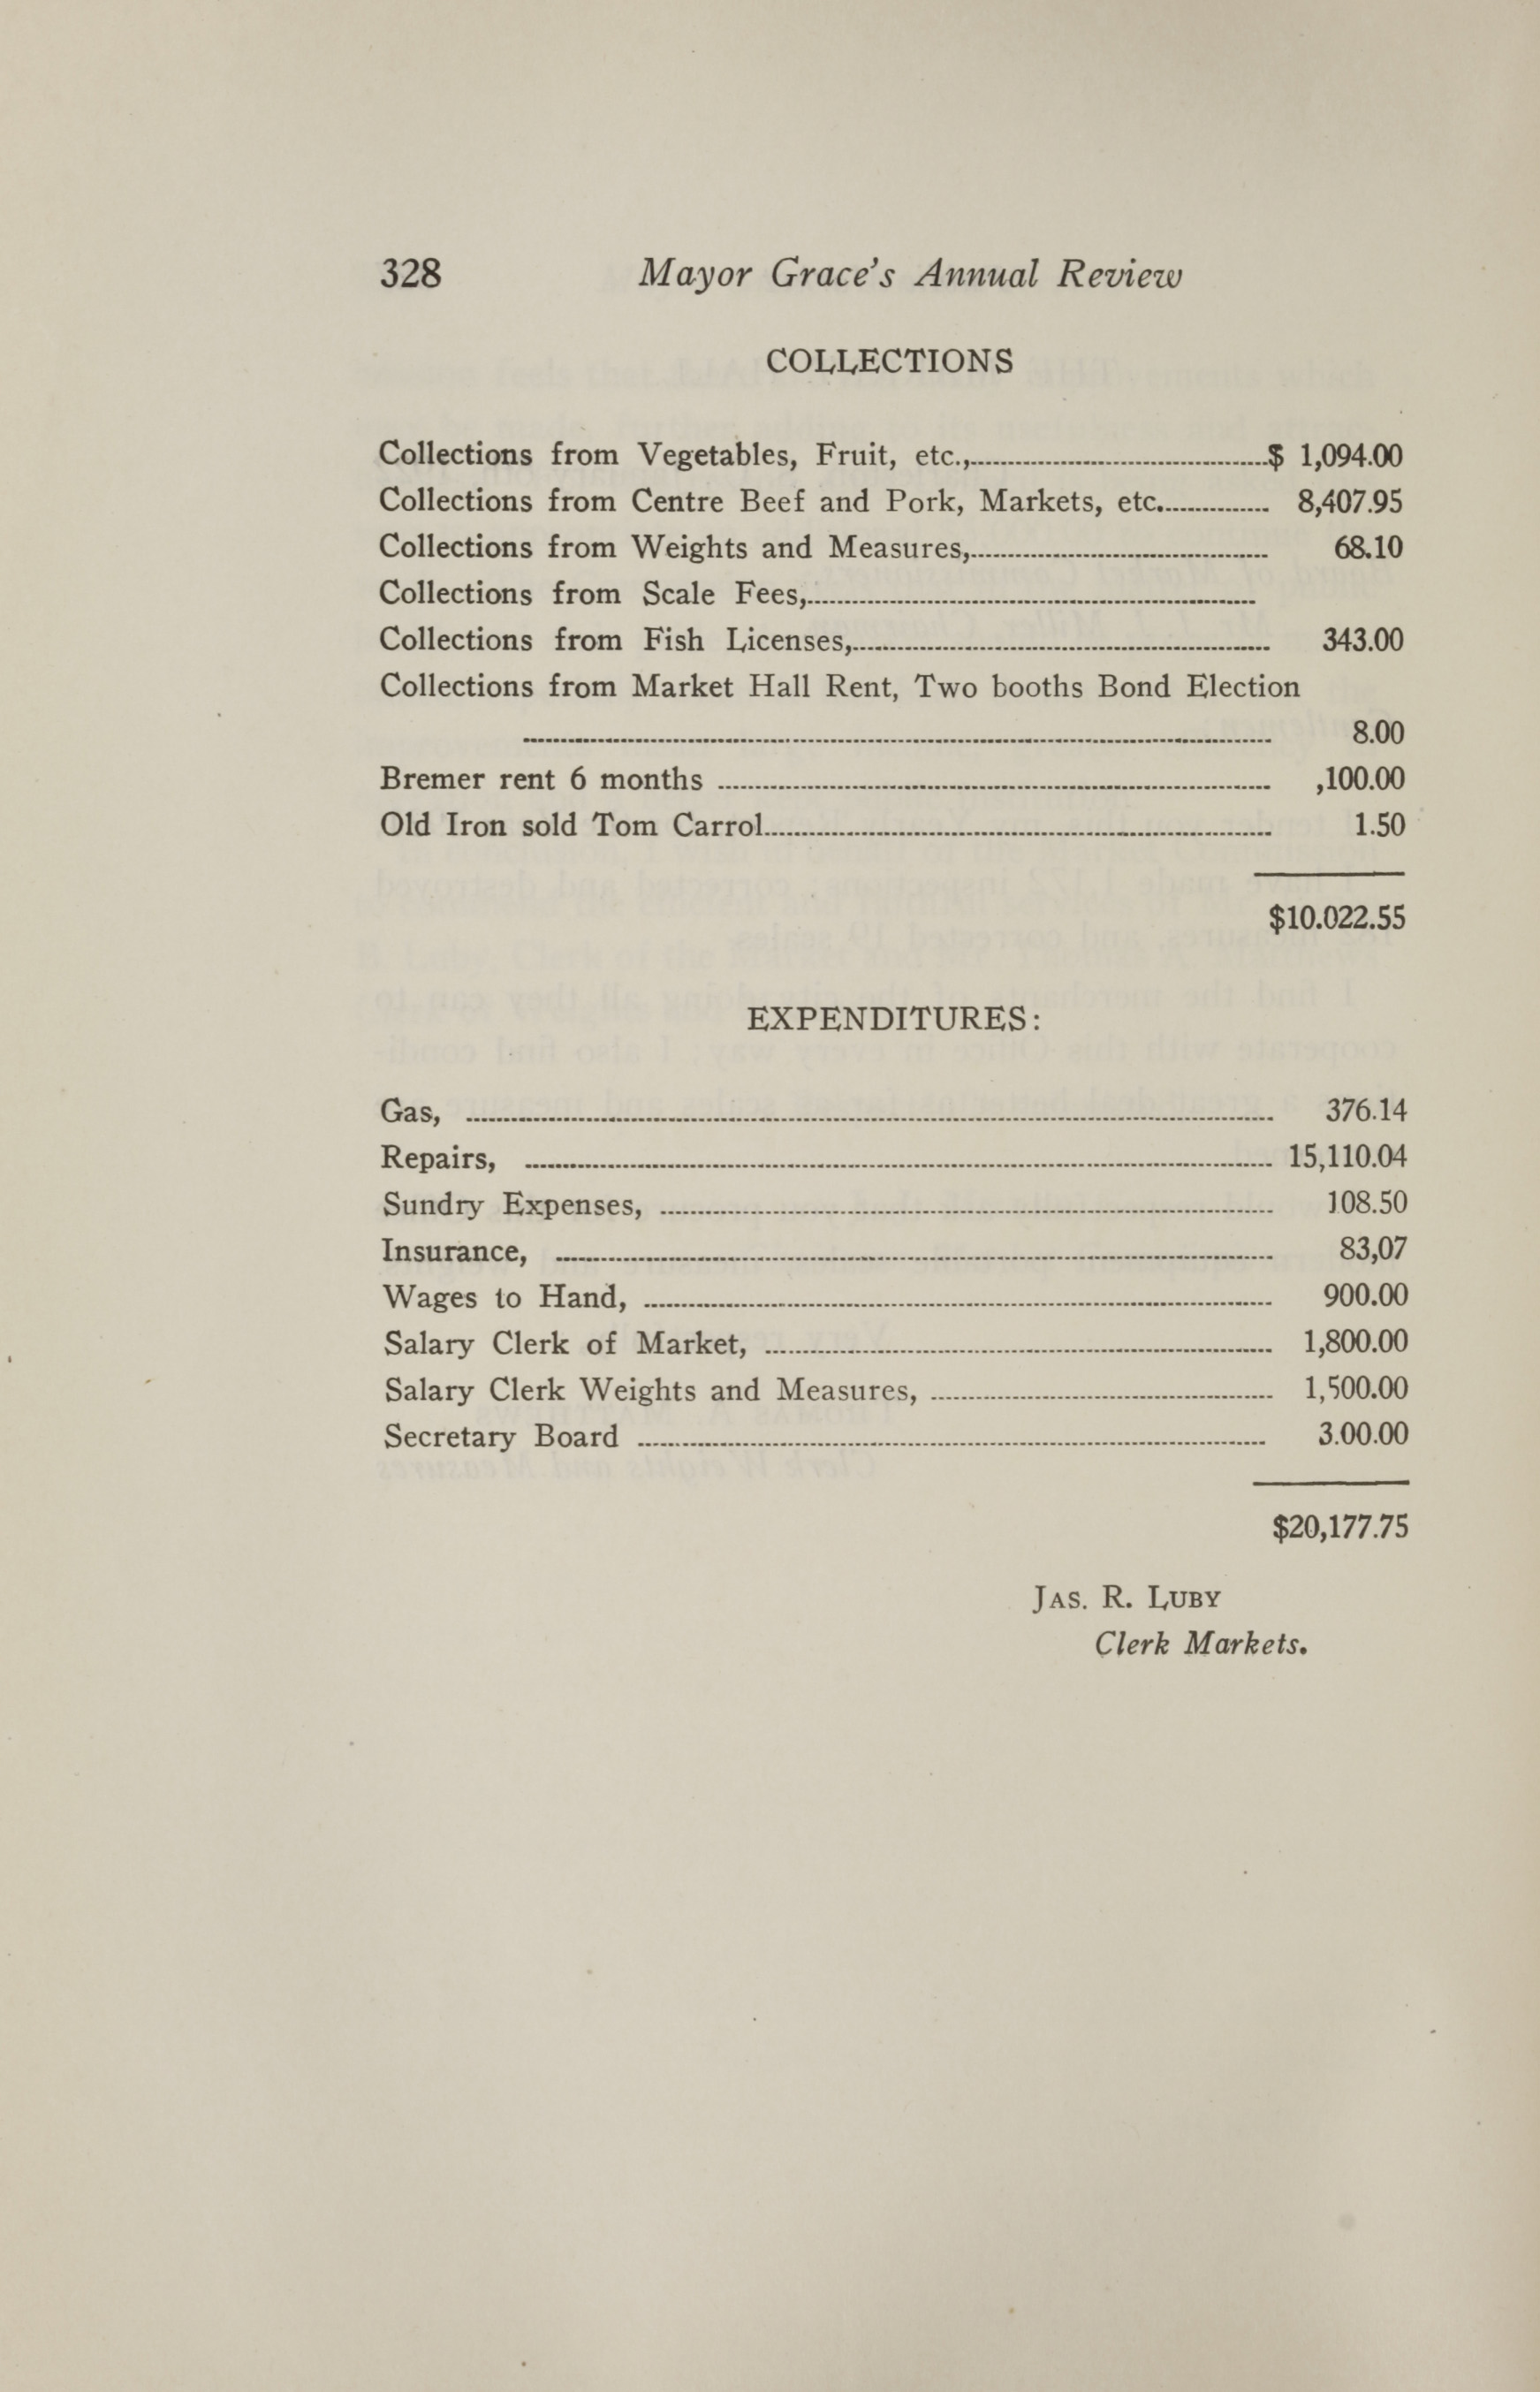 Charleston Yearbook, 1921, page 328